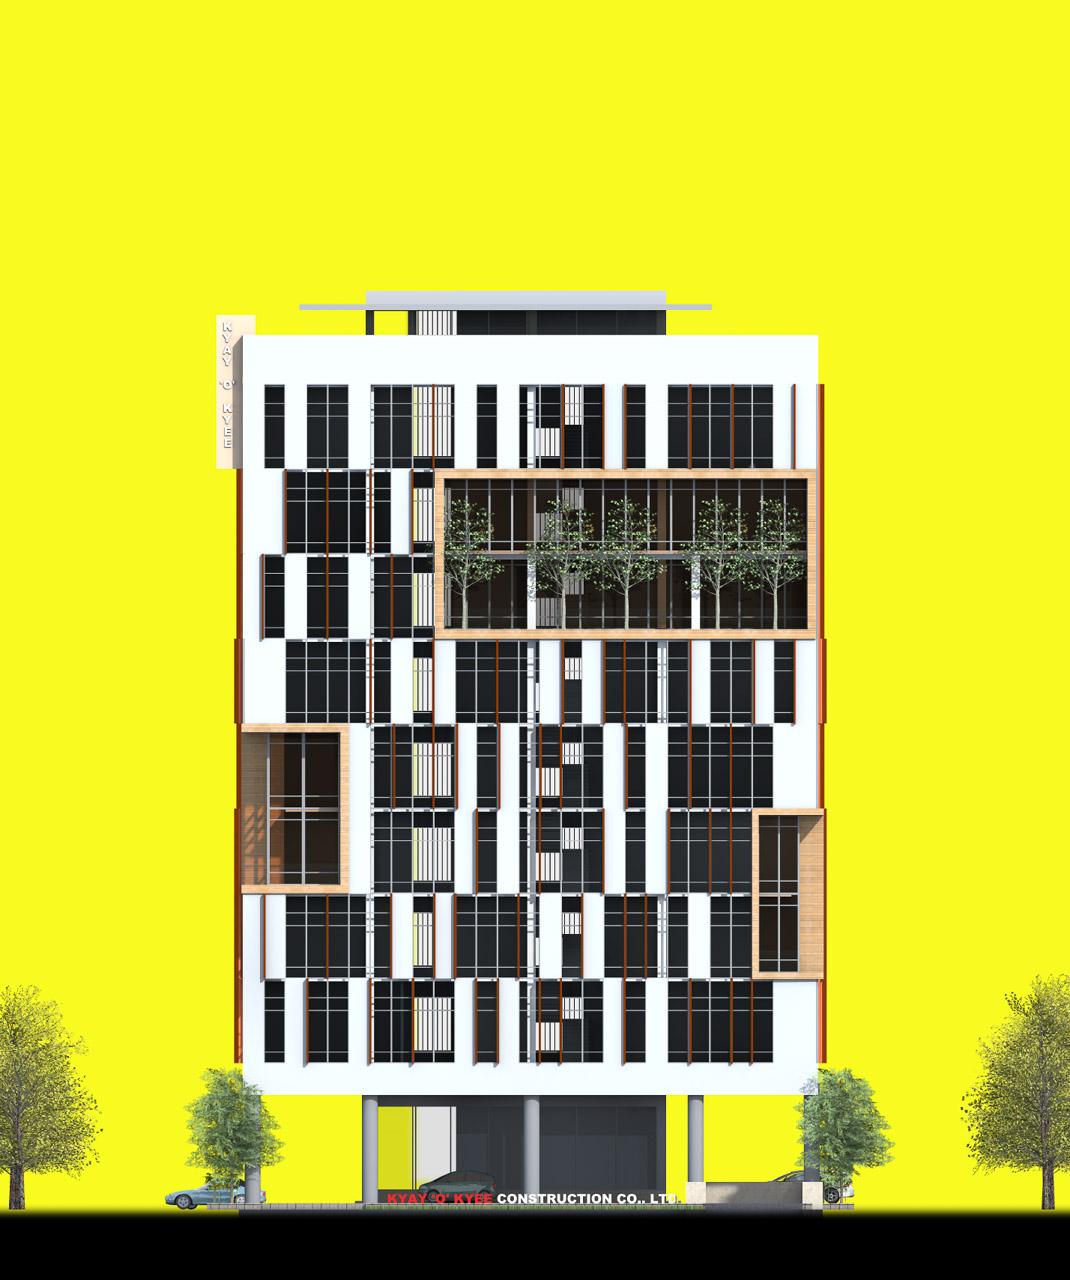 Kyay-O-Gyi-Construction-Mopa-Designs-Yangon-Myanmar-7